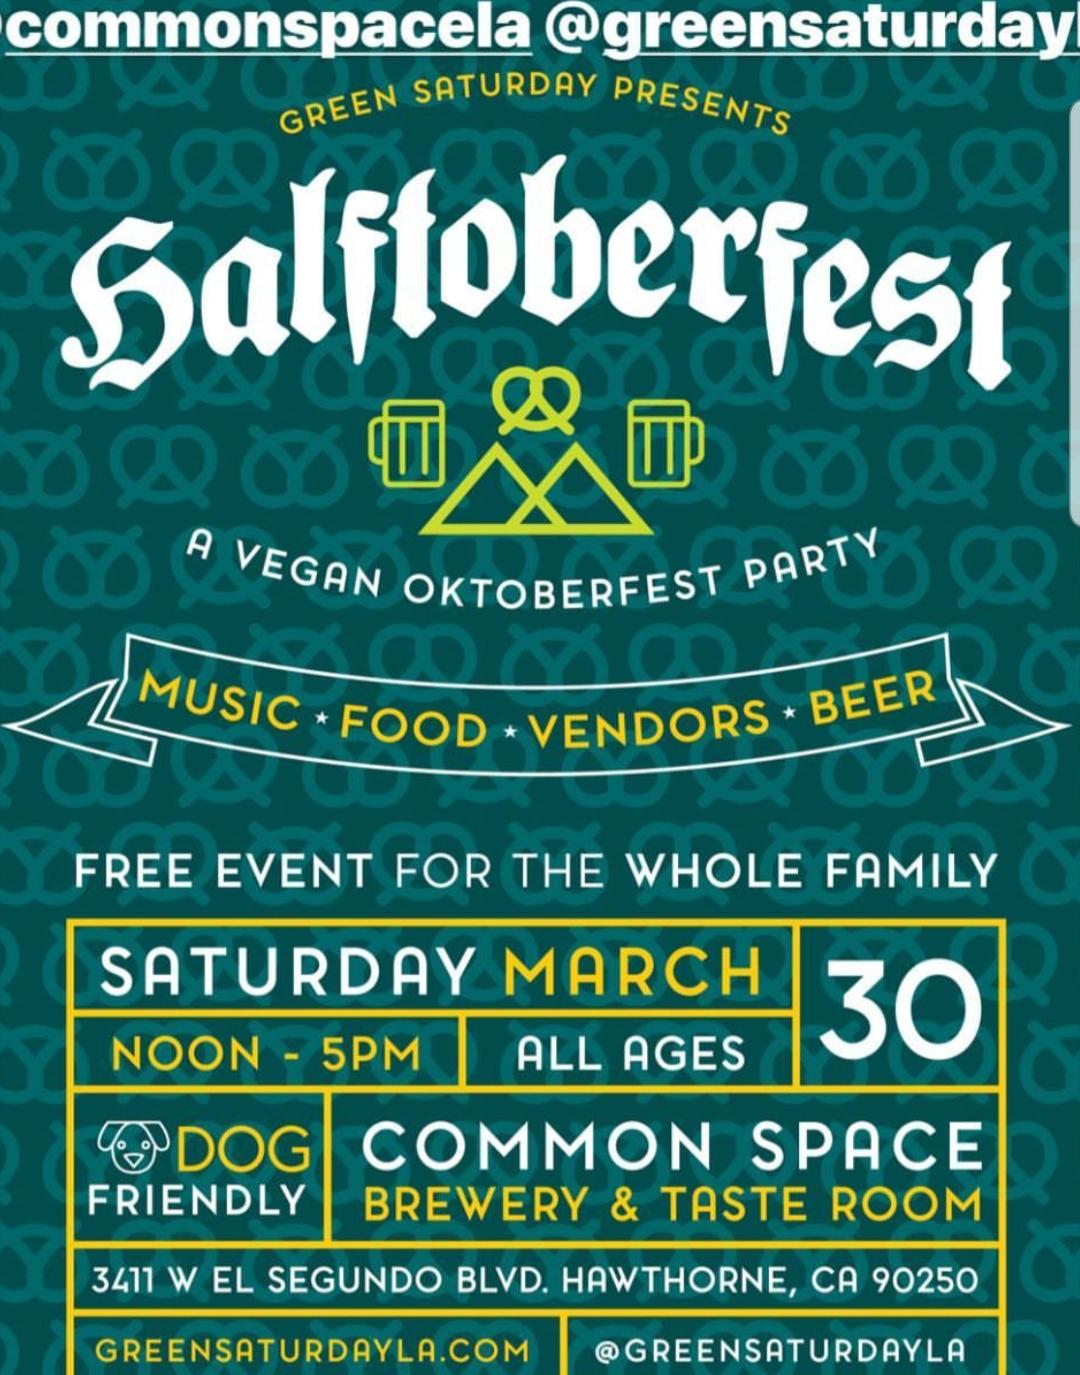 Halftoberfest